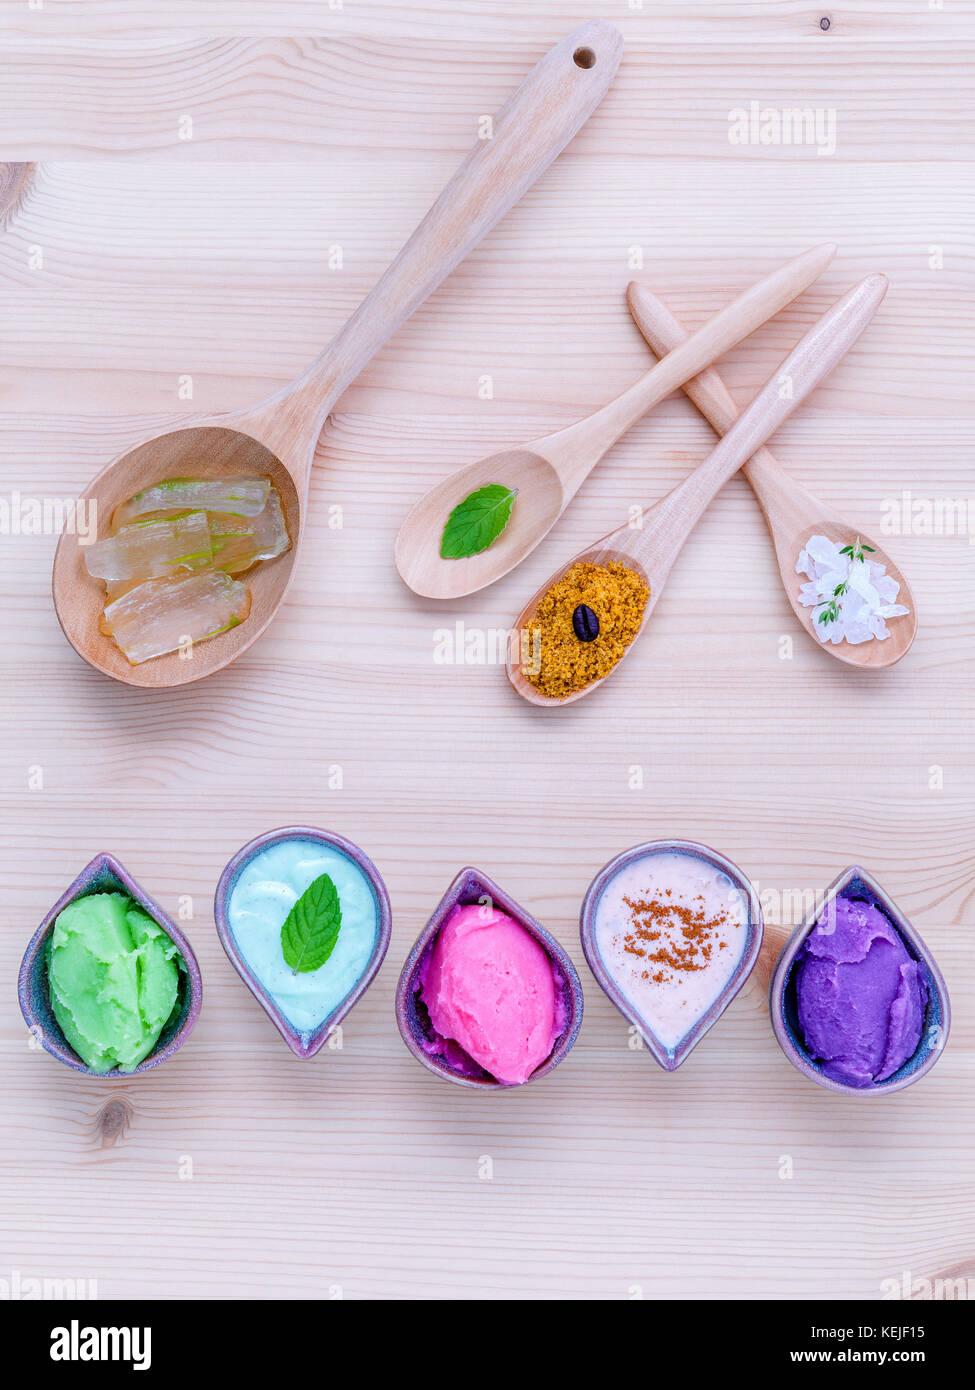 Alternative skin care and homemade scrubs lavender scrubs ,strawberry scrubs ,avocado scrubs and almond scrubs with Stock Photo